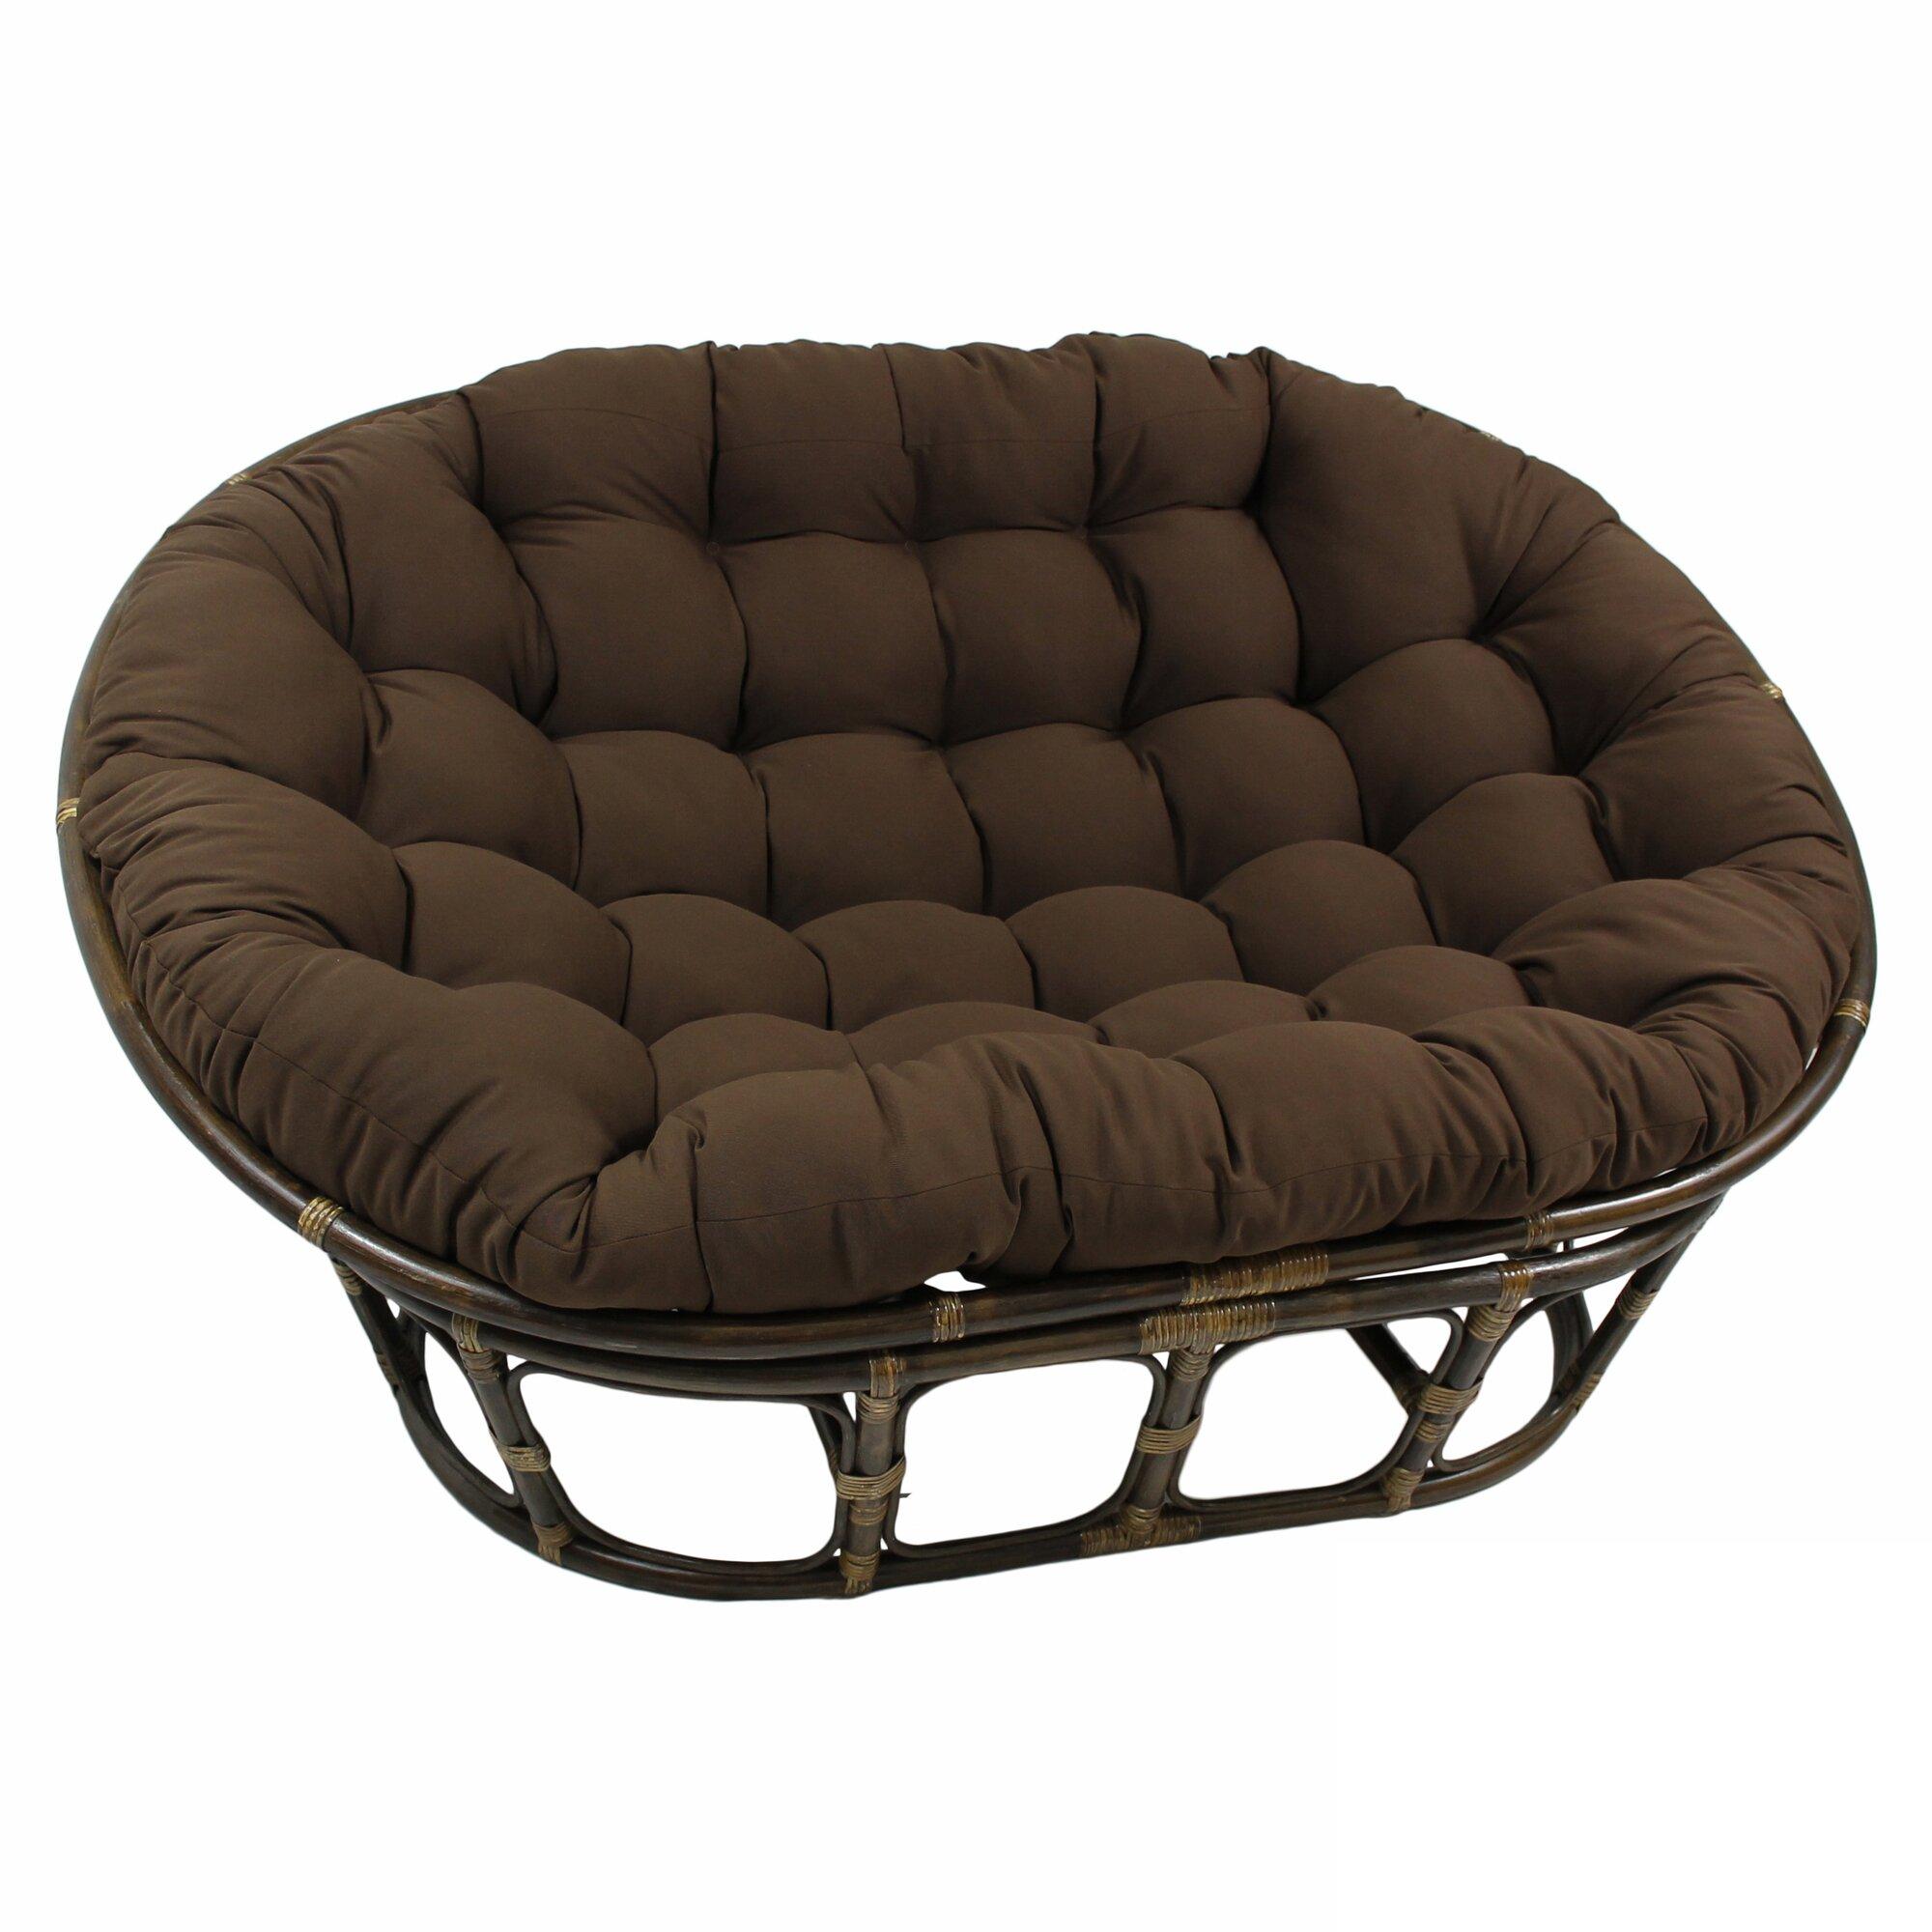 100 ideas Papasan Chair Slipcover on newhomeidea